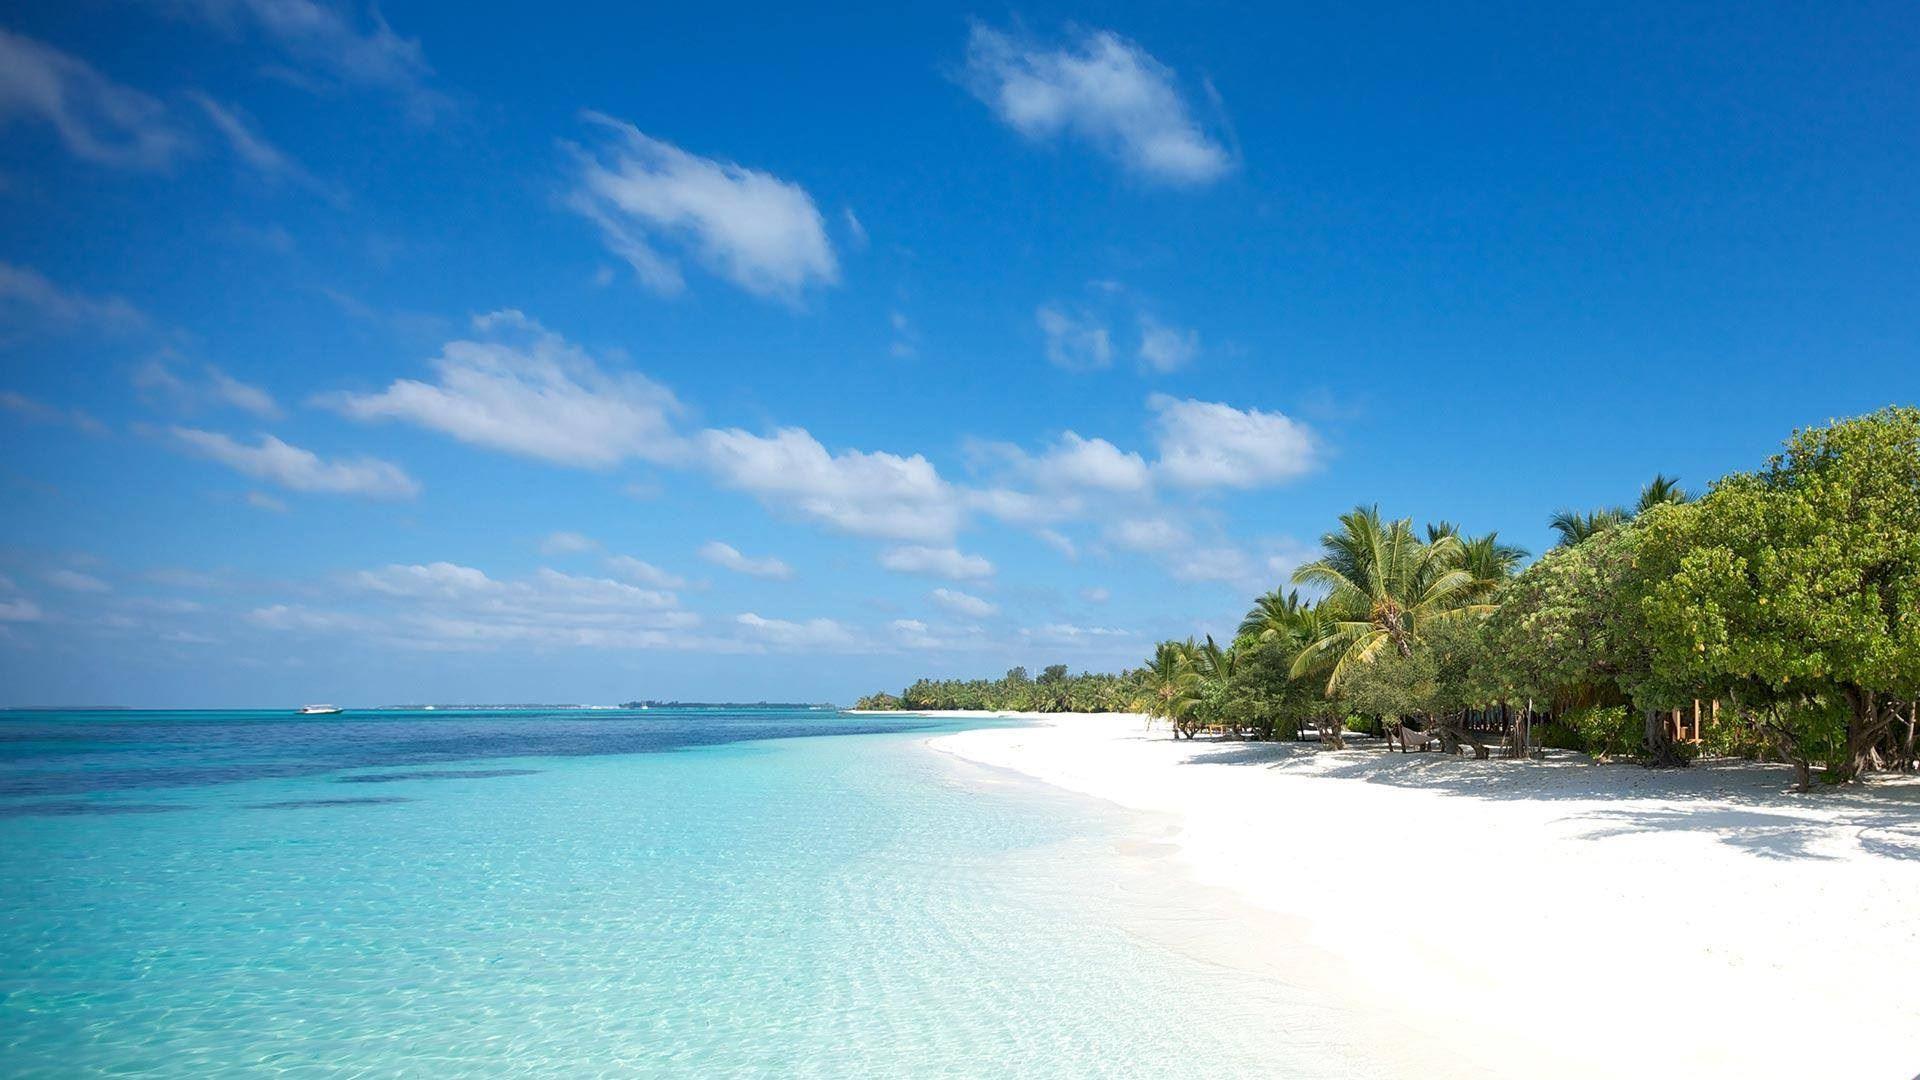 Bãi biển An Bàng - Hội An